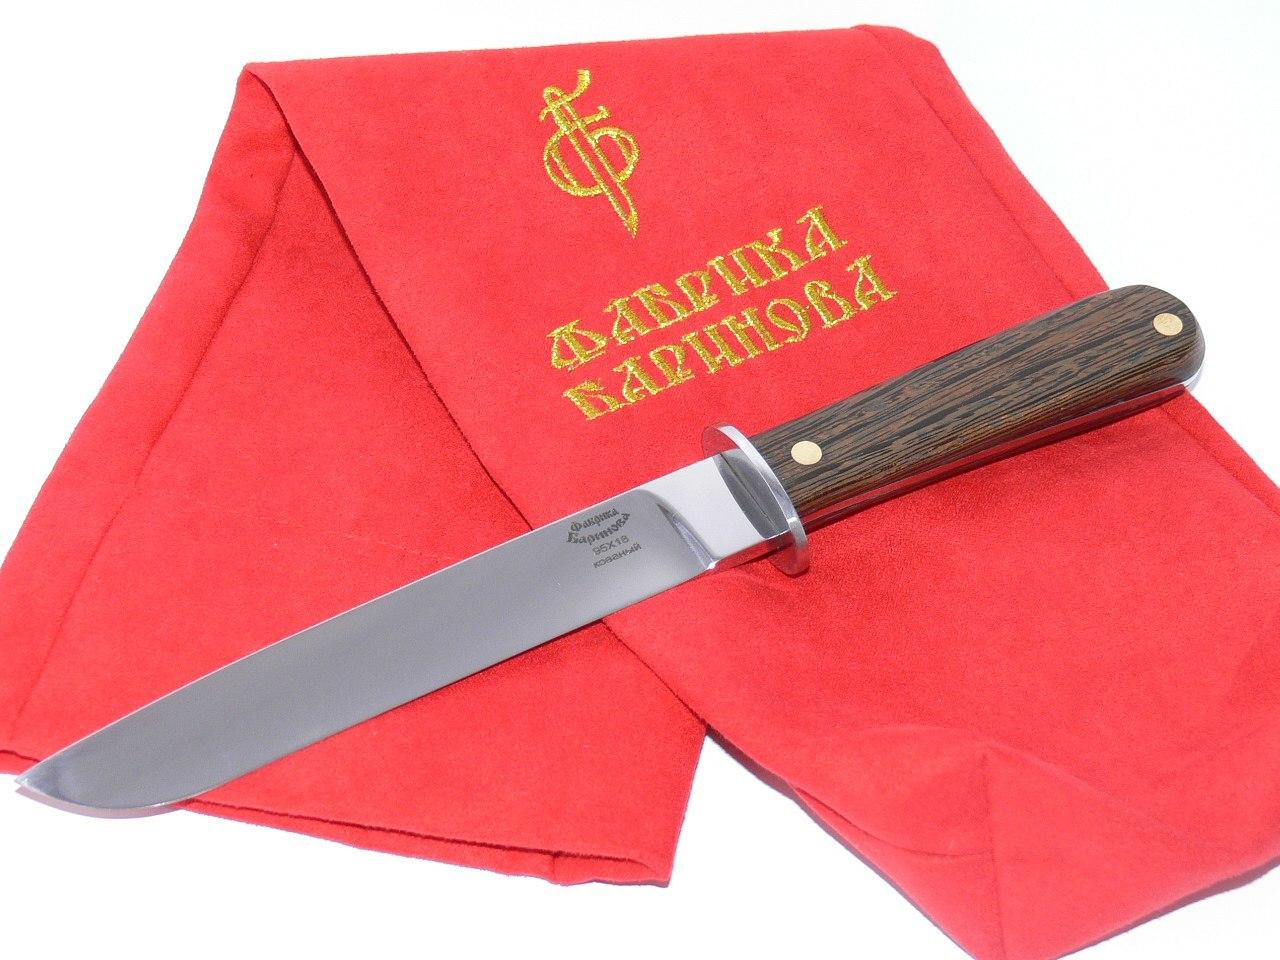 Фото 5 - Нож Окопник-2, сталь 95Х18, венге от Фабрика Баринова